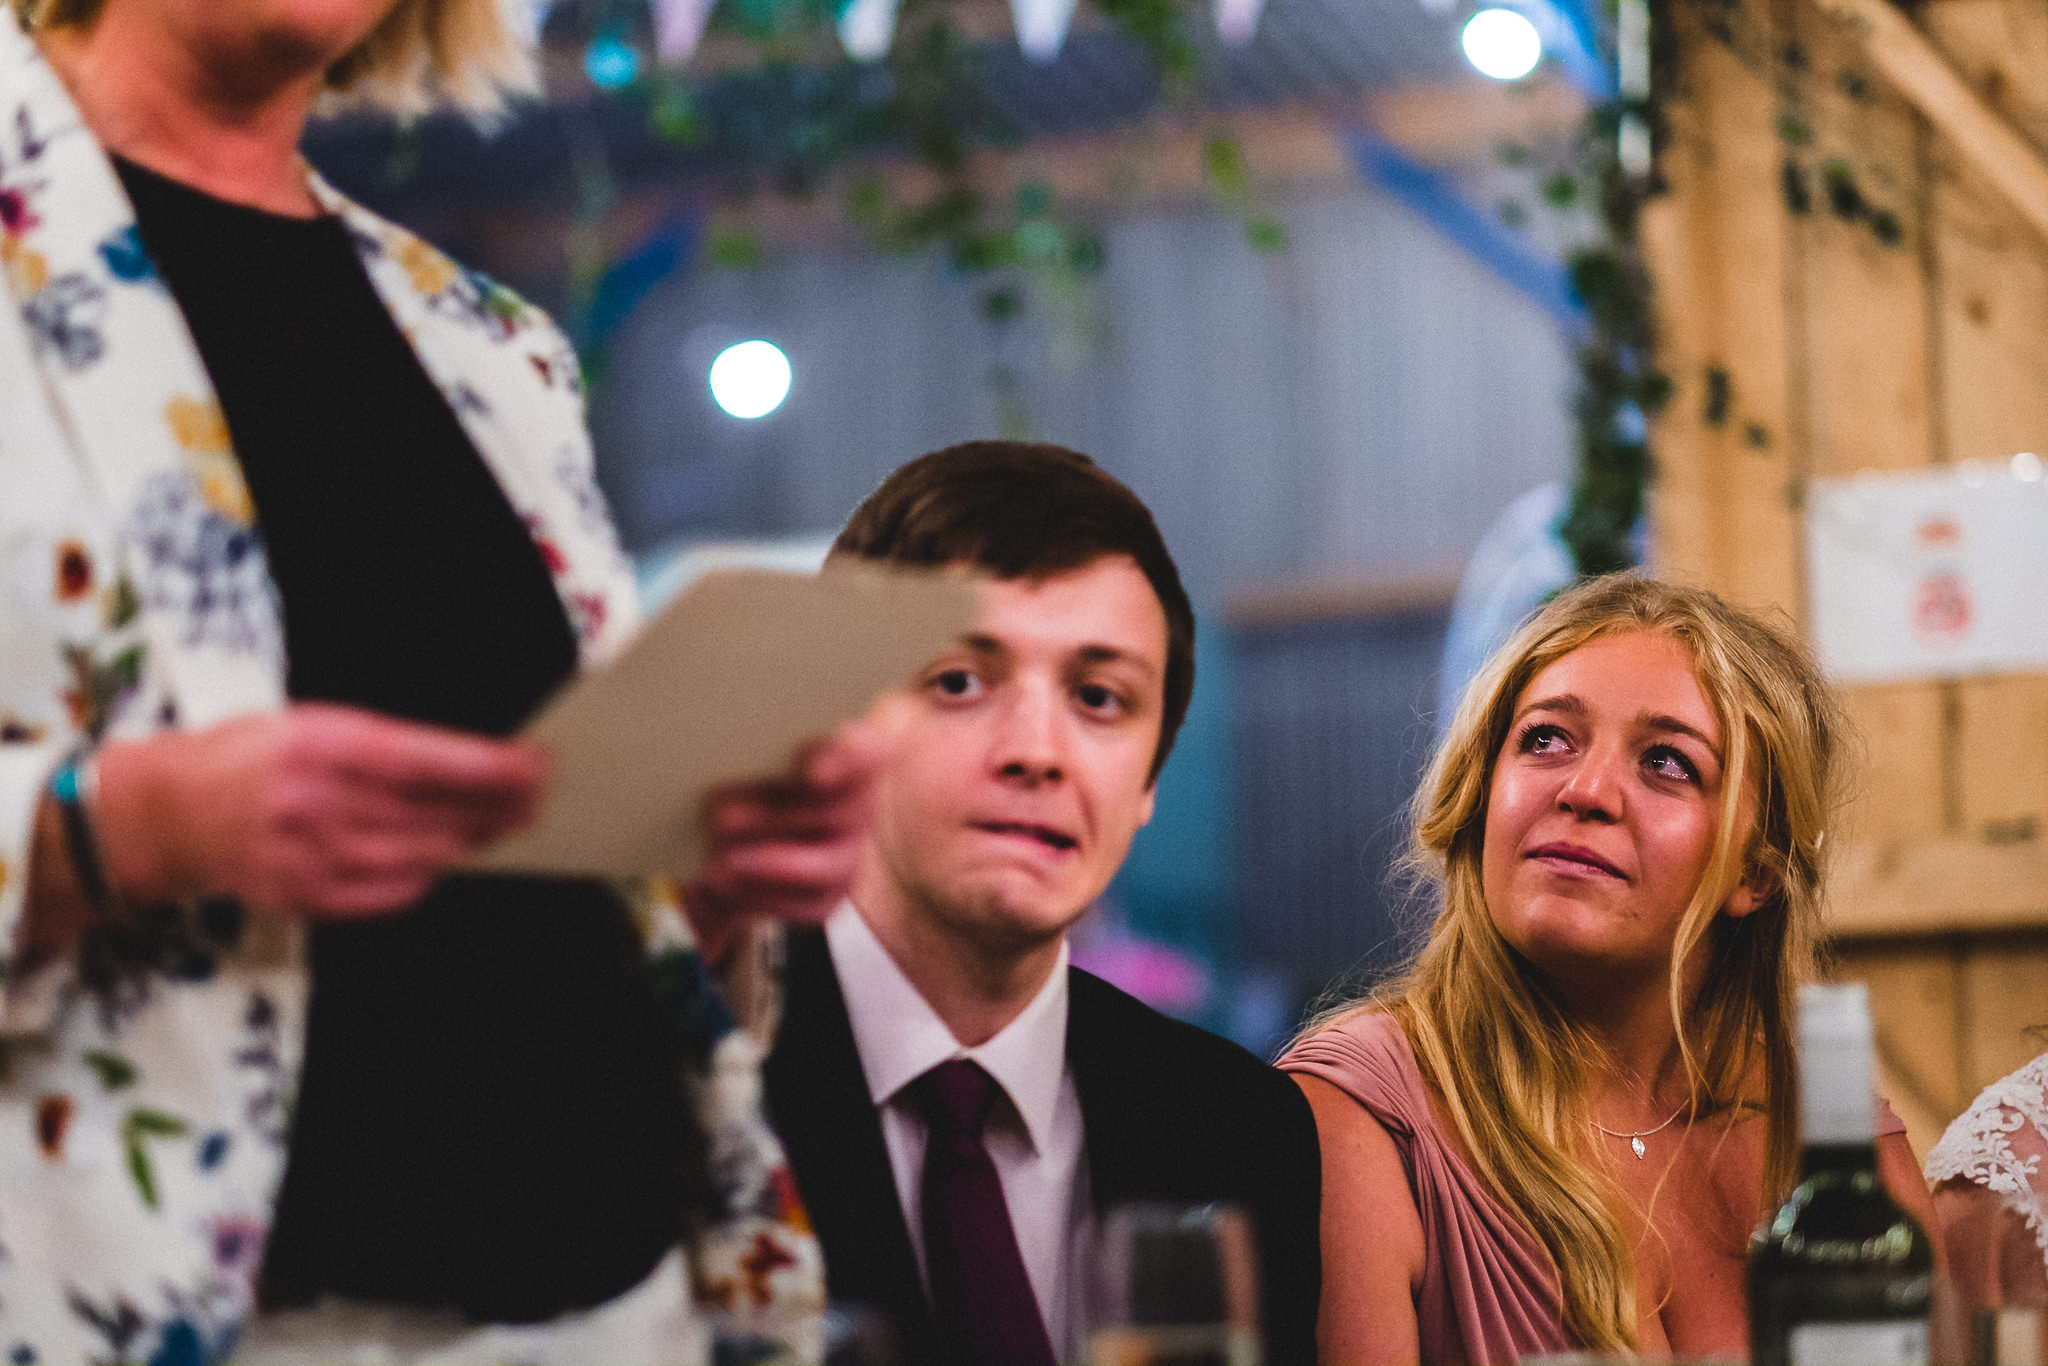 Groom giving emotional wedding speech